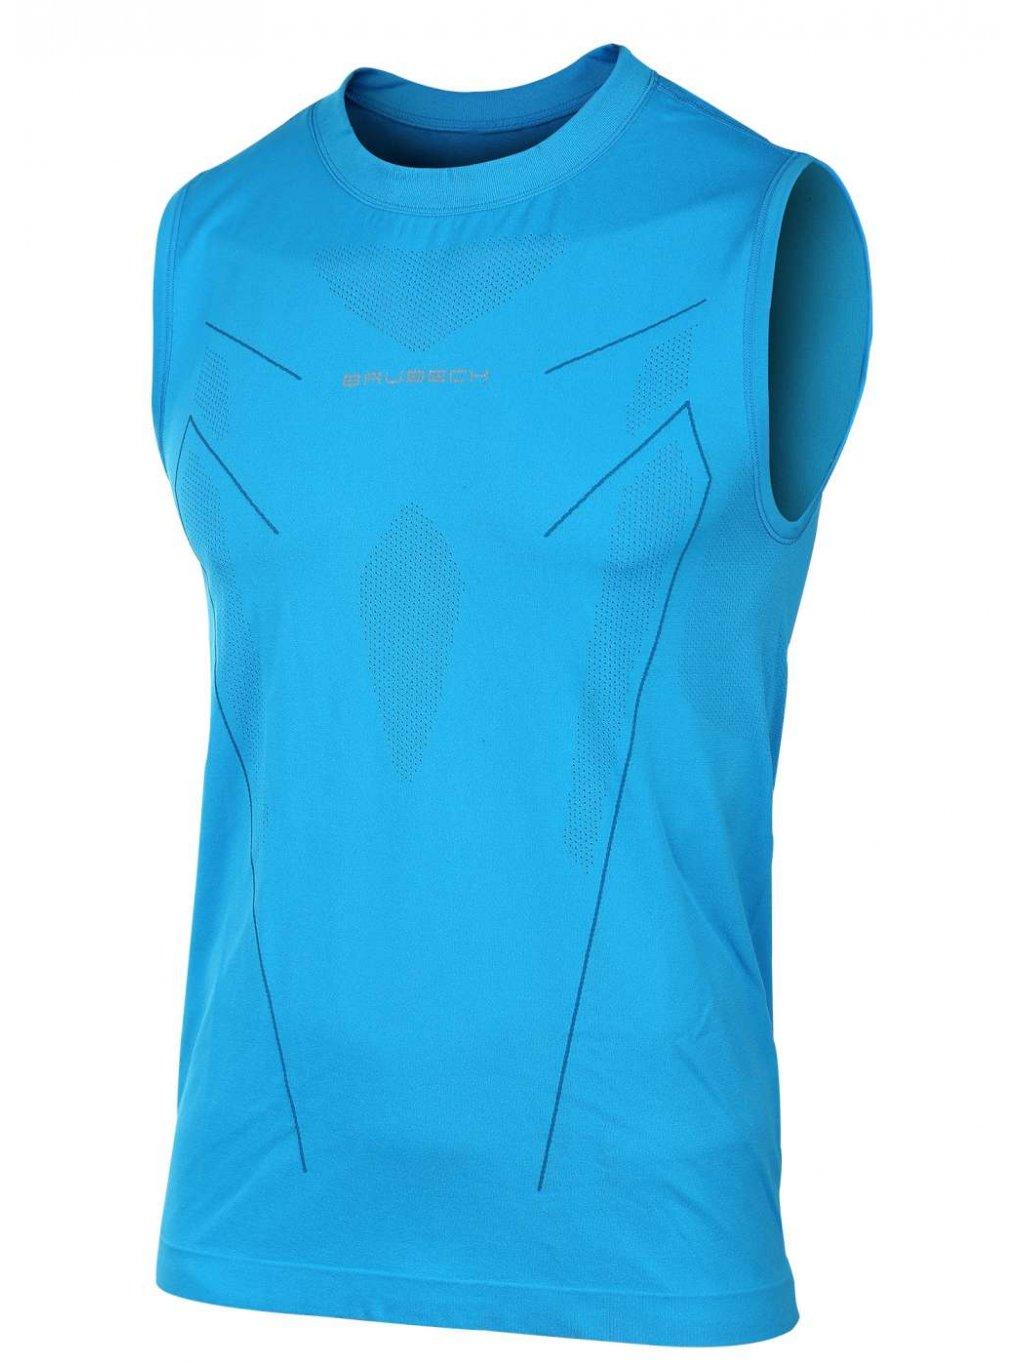 Brubeck pánské tričko bez rukávů Athletic - BRUBECK cfb6102d43